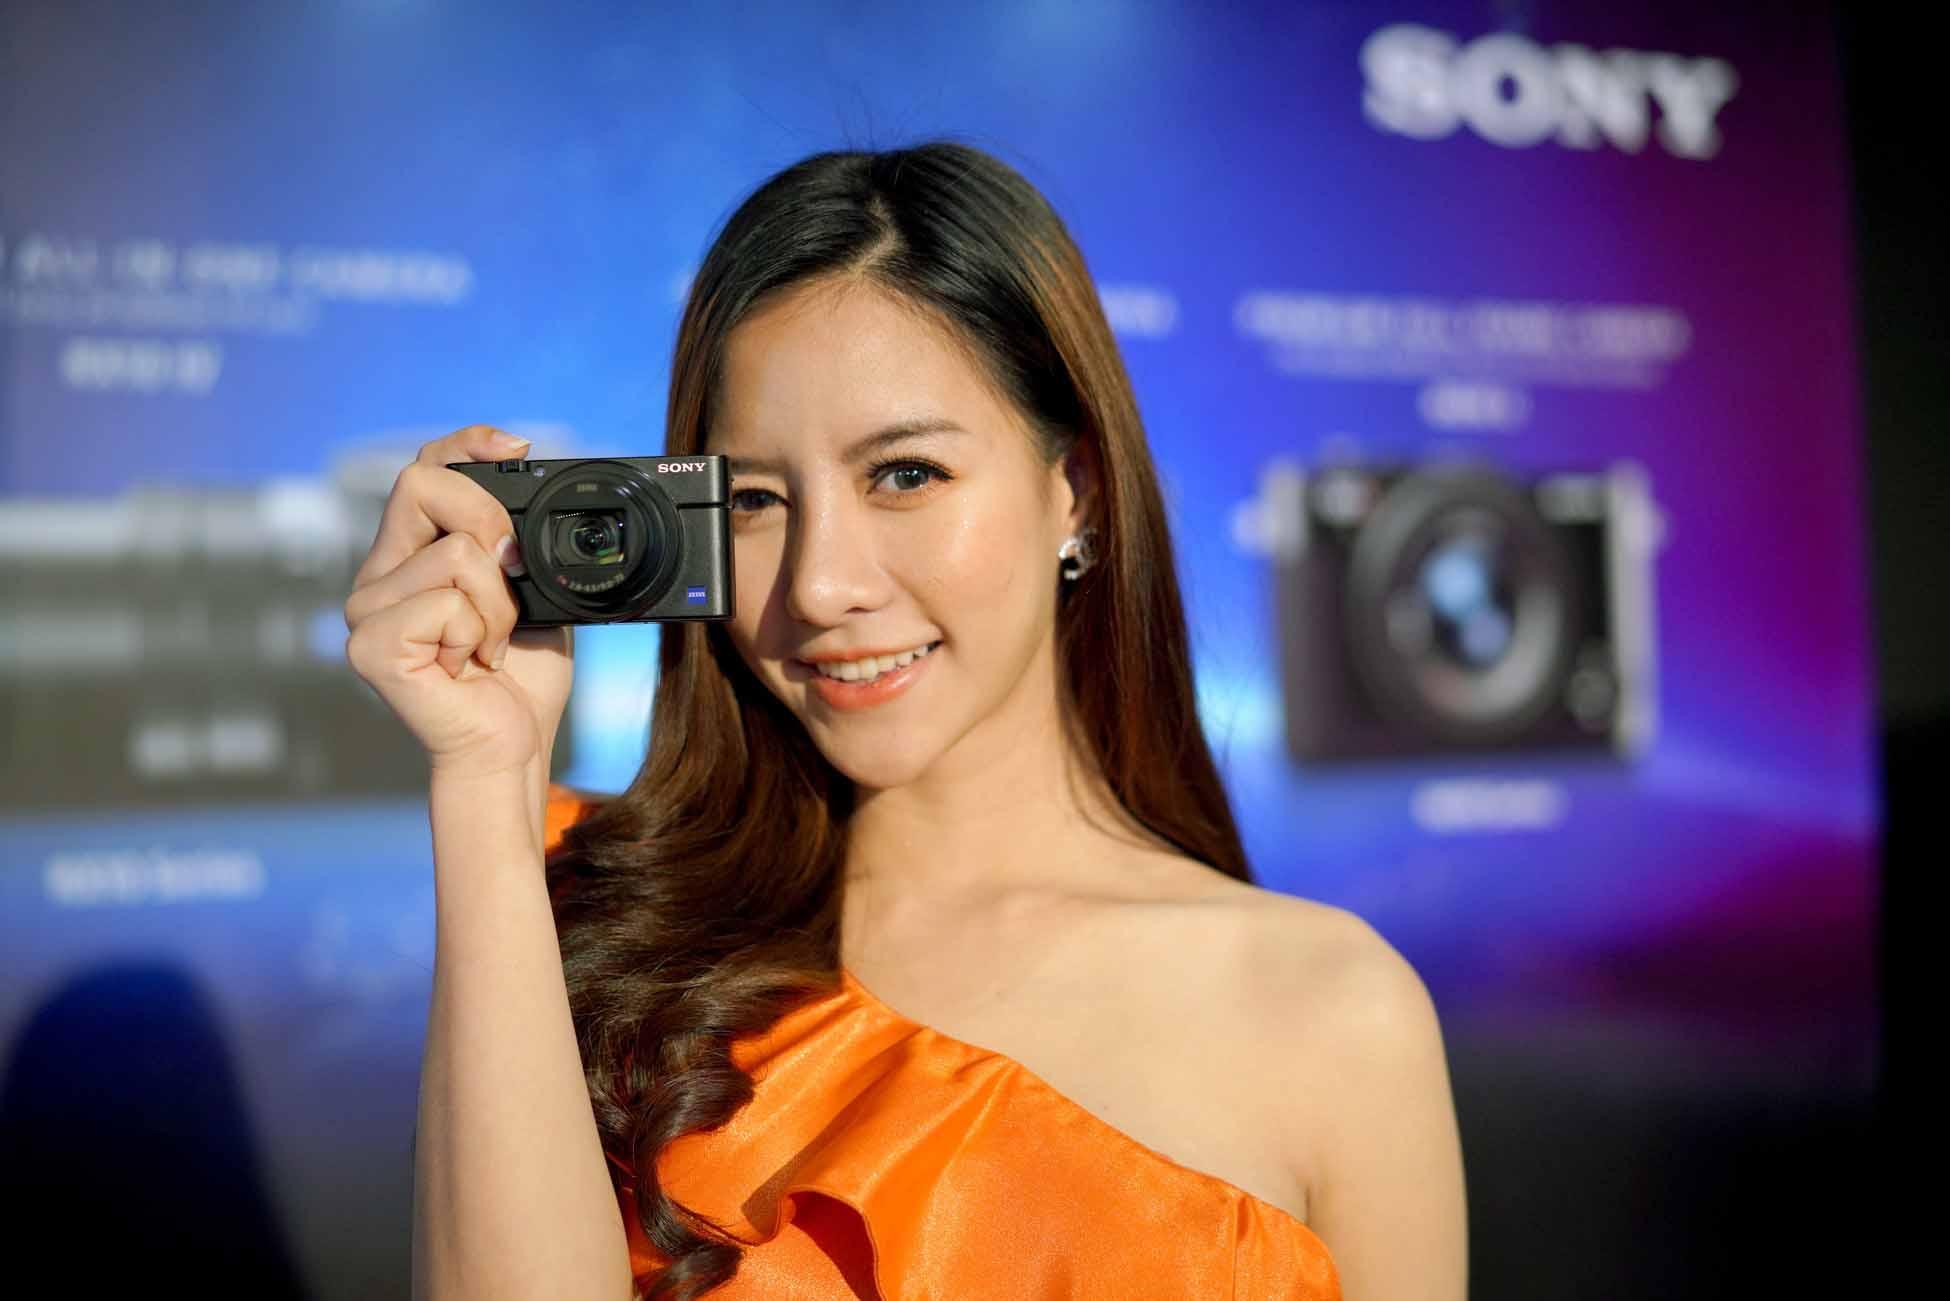 Pic กล้อง Rx100 Vii (อาร์เอ็กซ์ 100 มาร์คเซเว่น) 04